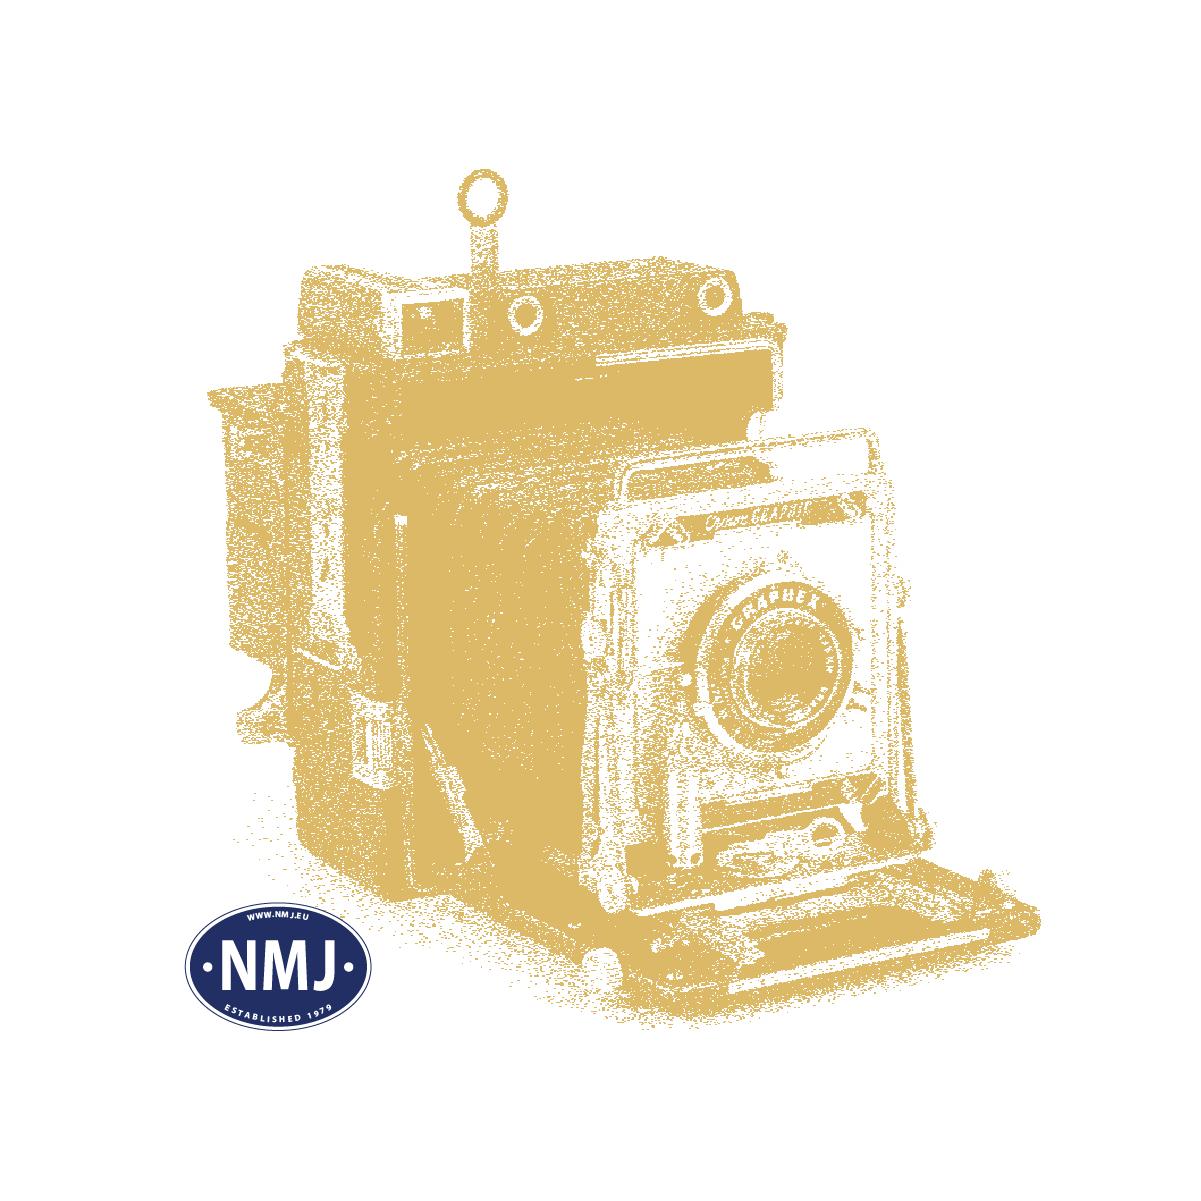 NOC07026 - XL Gresstuster/Blomster, 42 Stk, Gul